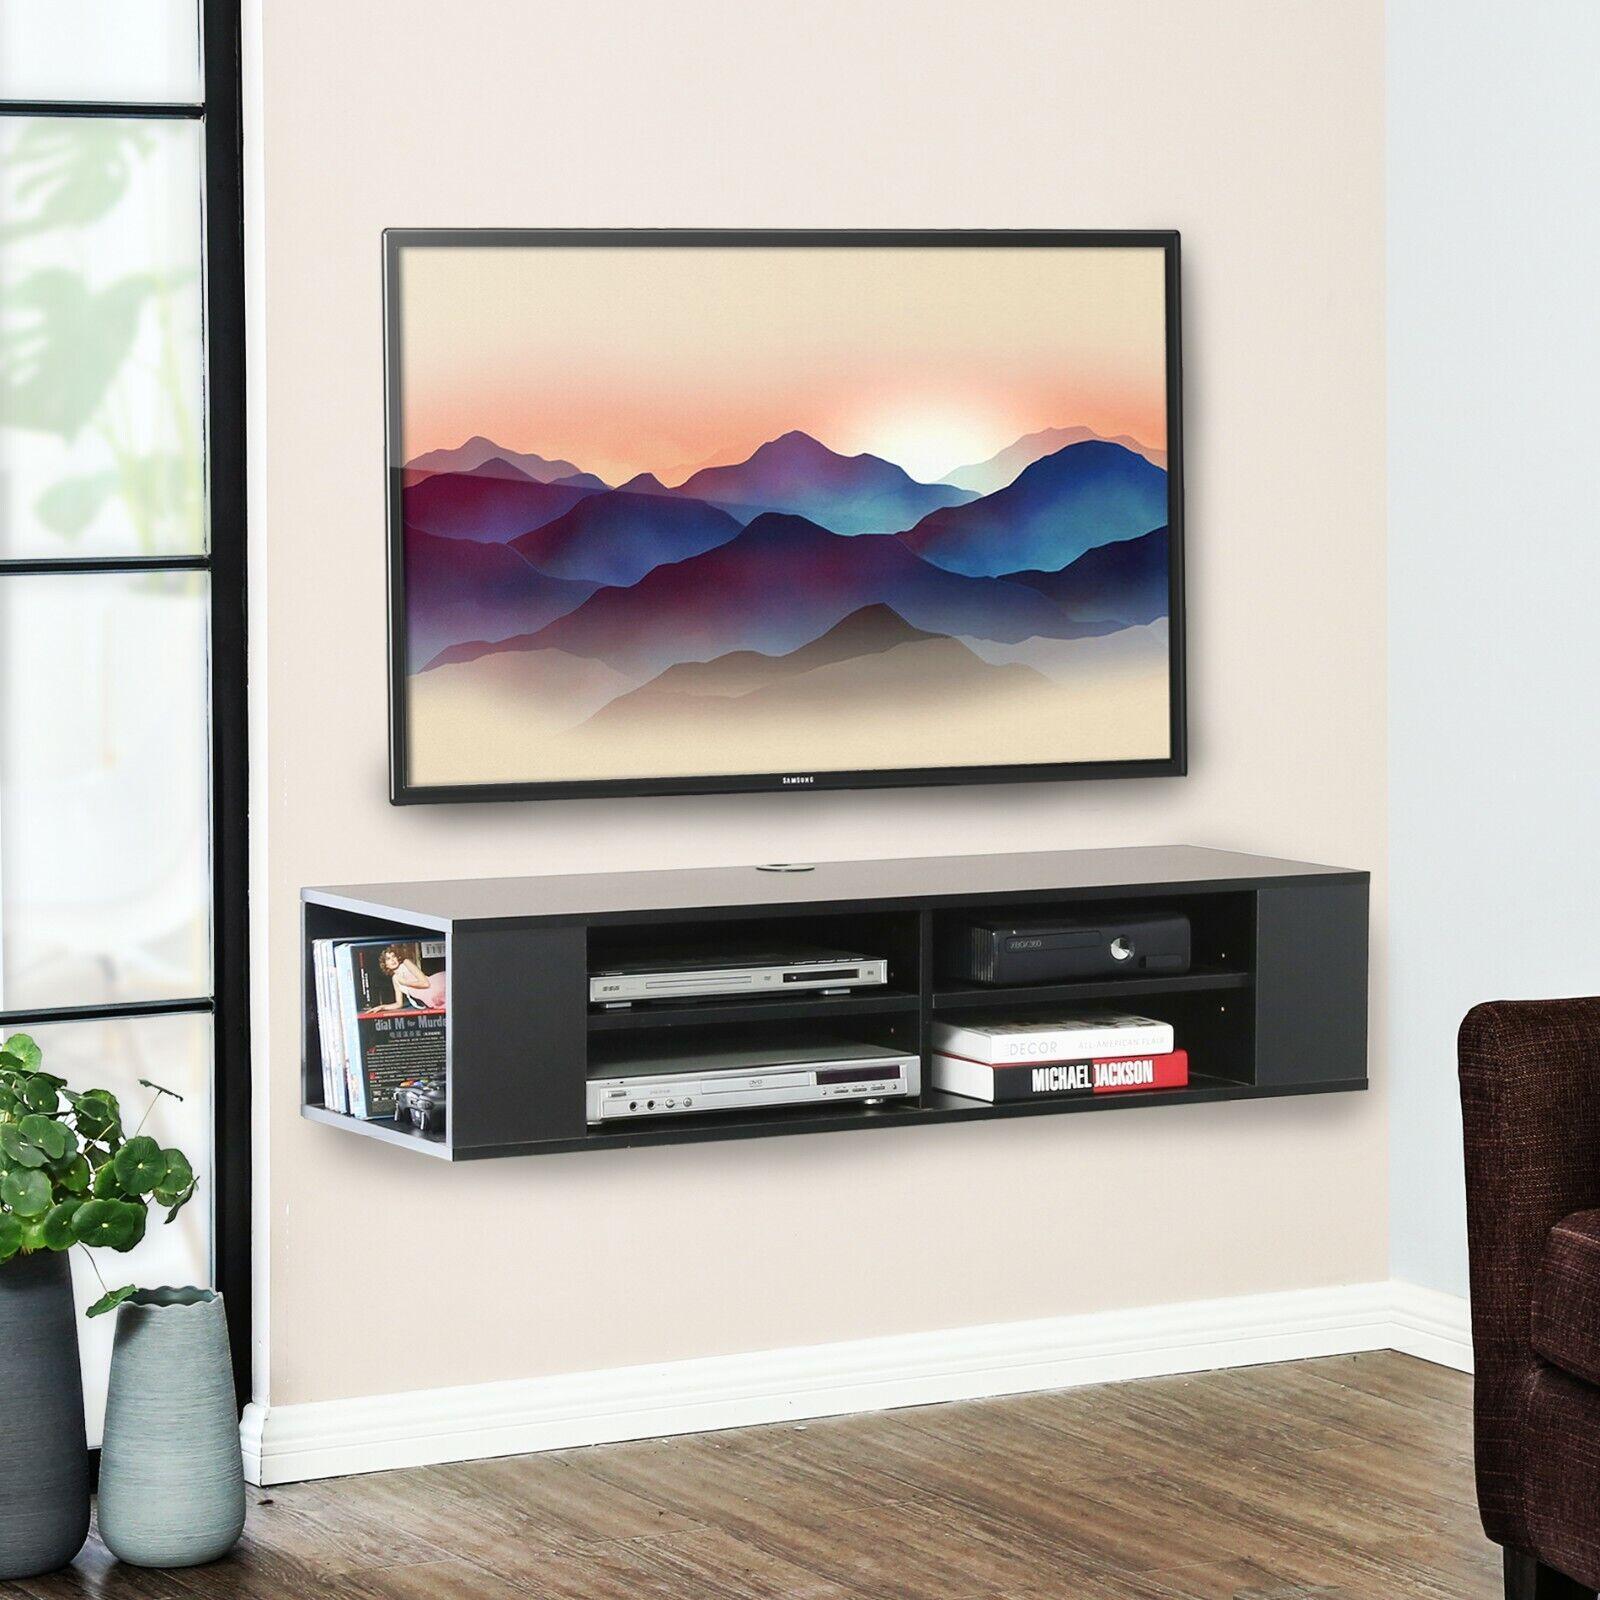 FITUEYES Universal Wall Mount Media/AV Console,Floating TV S